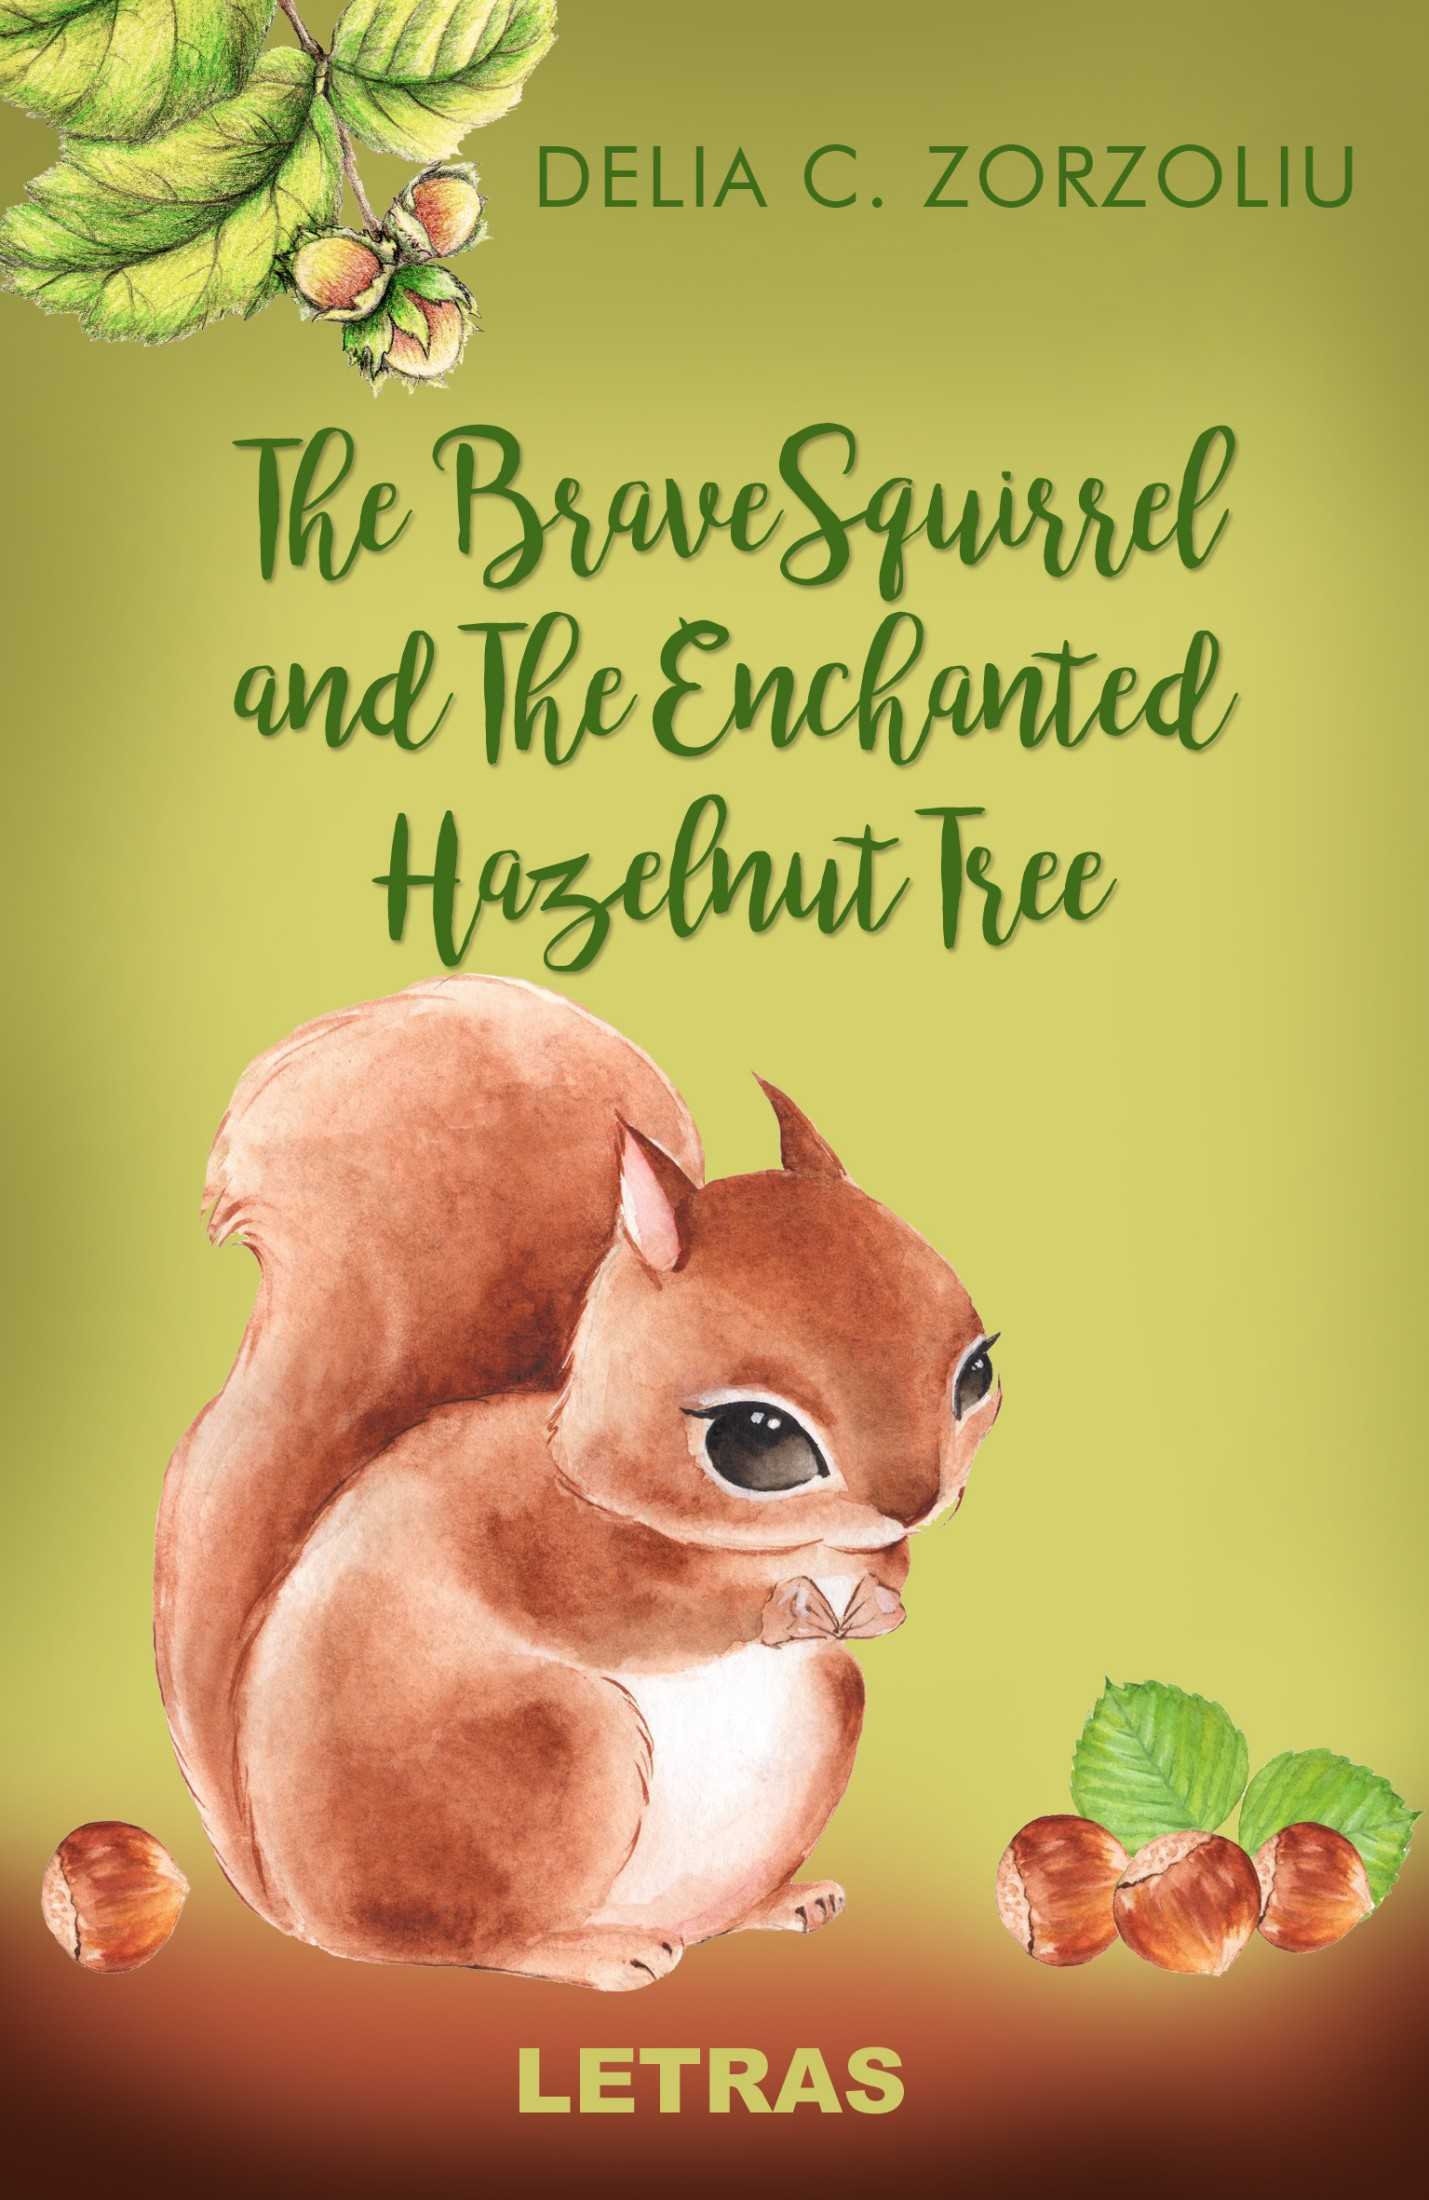 Brave Squirrel and The Enchanted Hazelnut Tree - Zorzoliu C. Delia